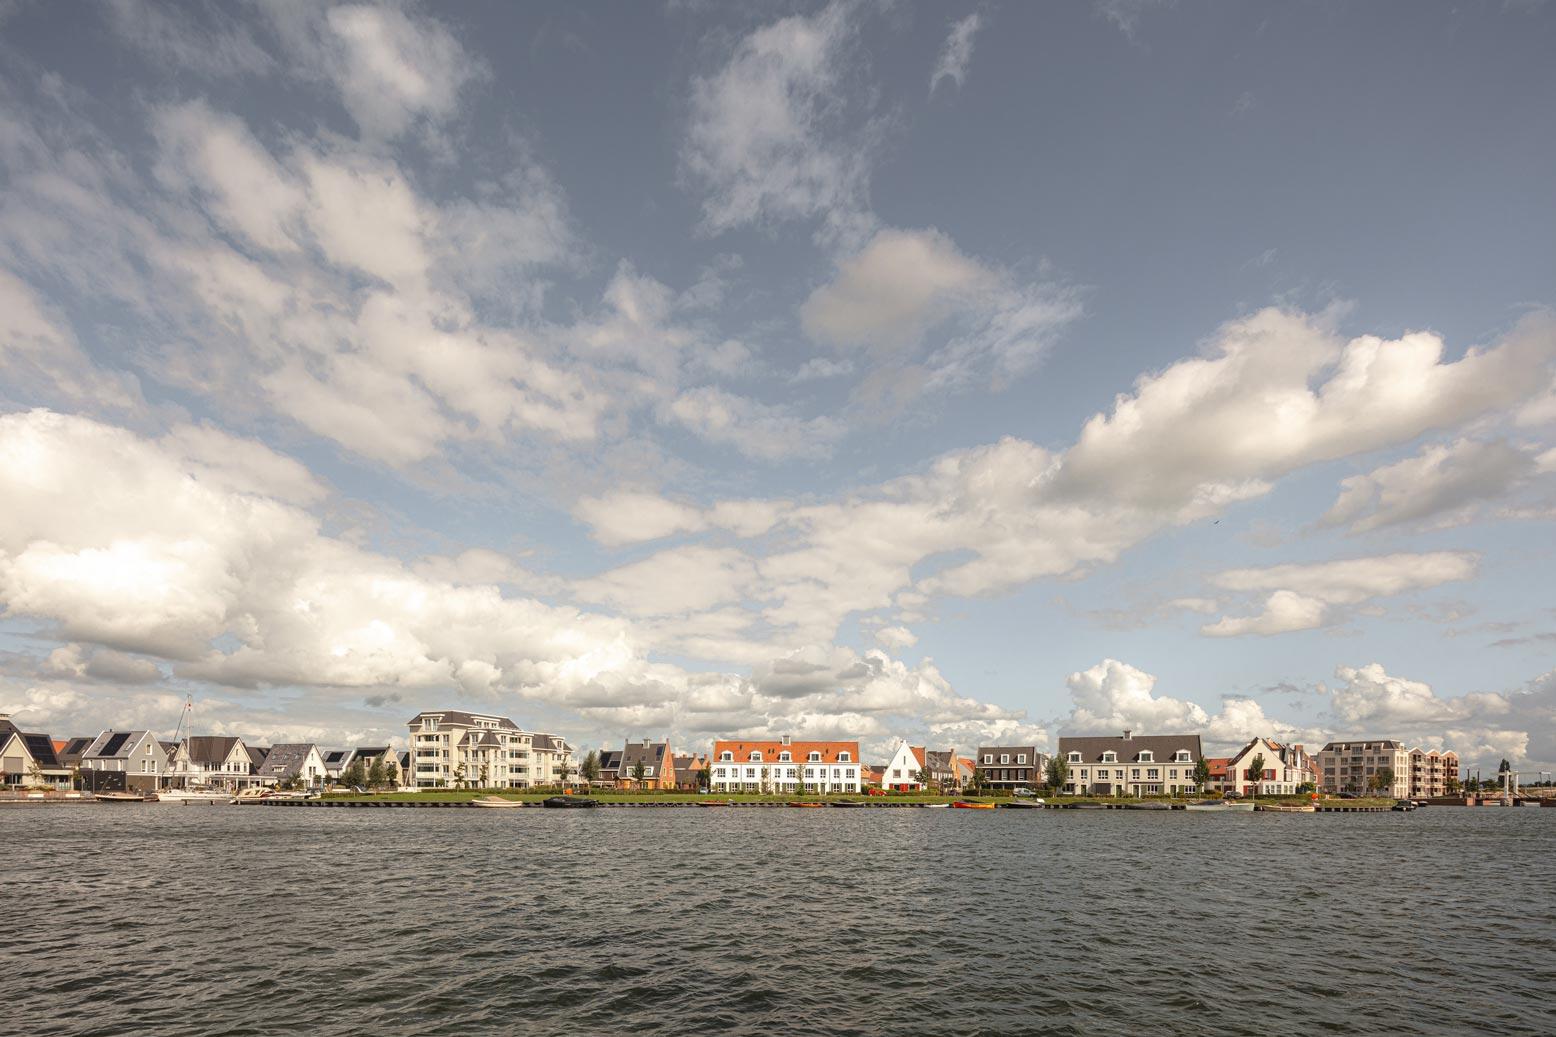 Synchroon-Circulair-Waterfont-Harderwijk